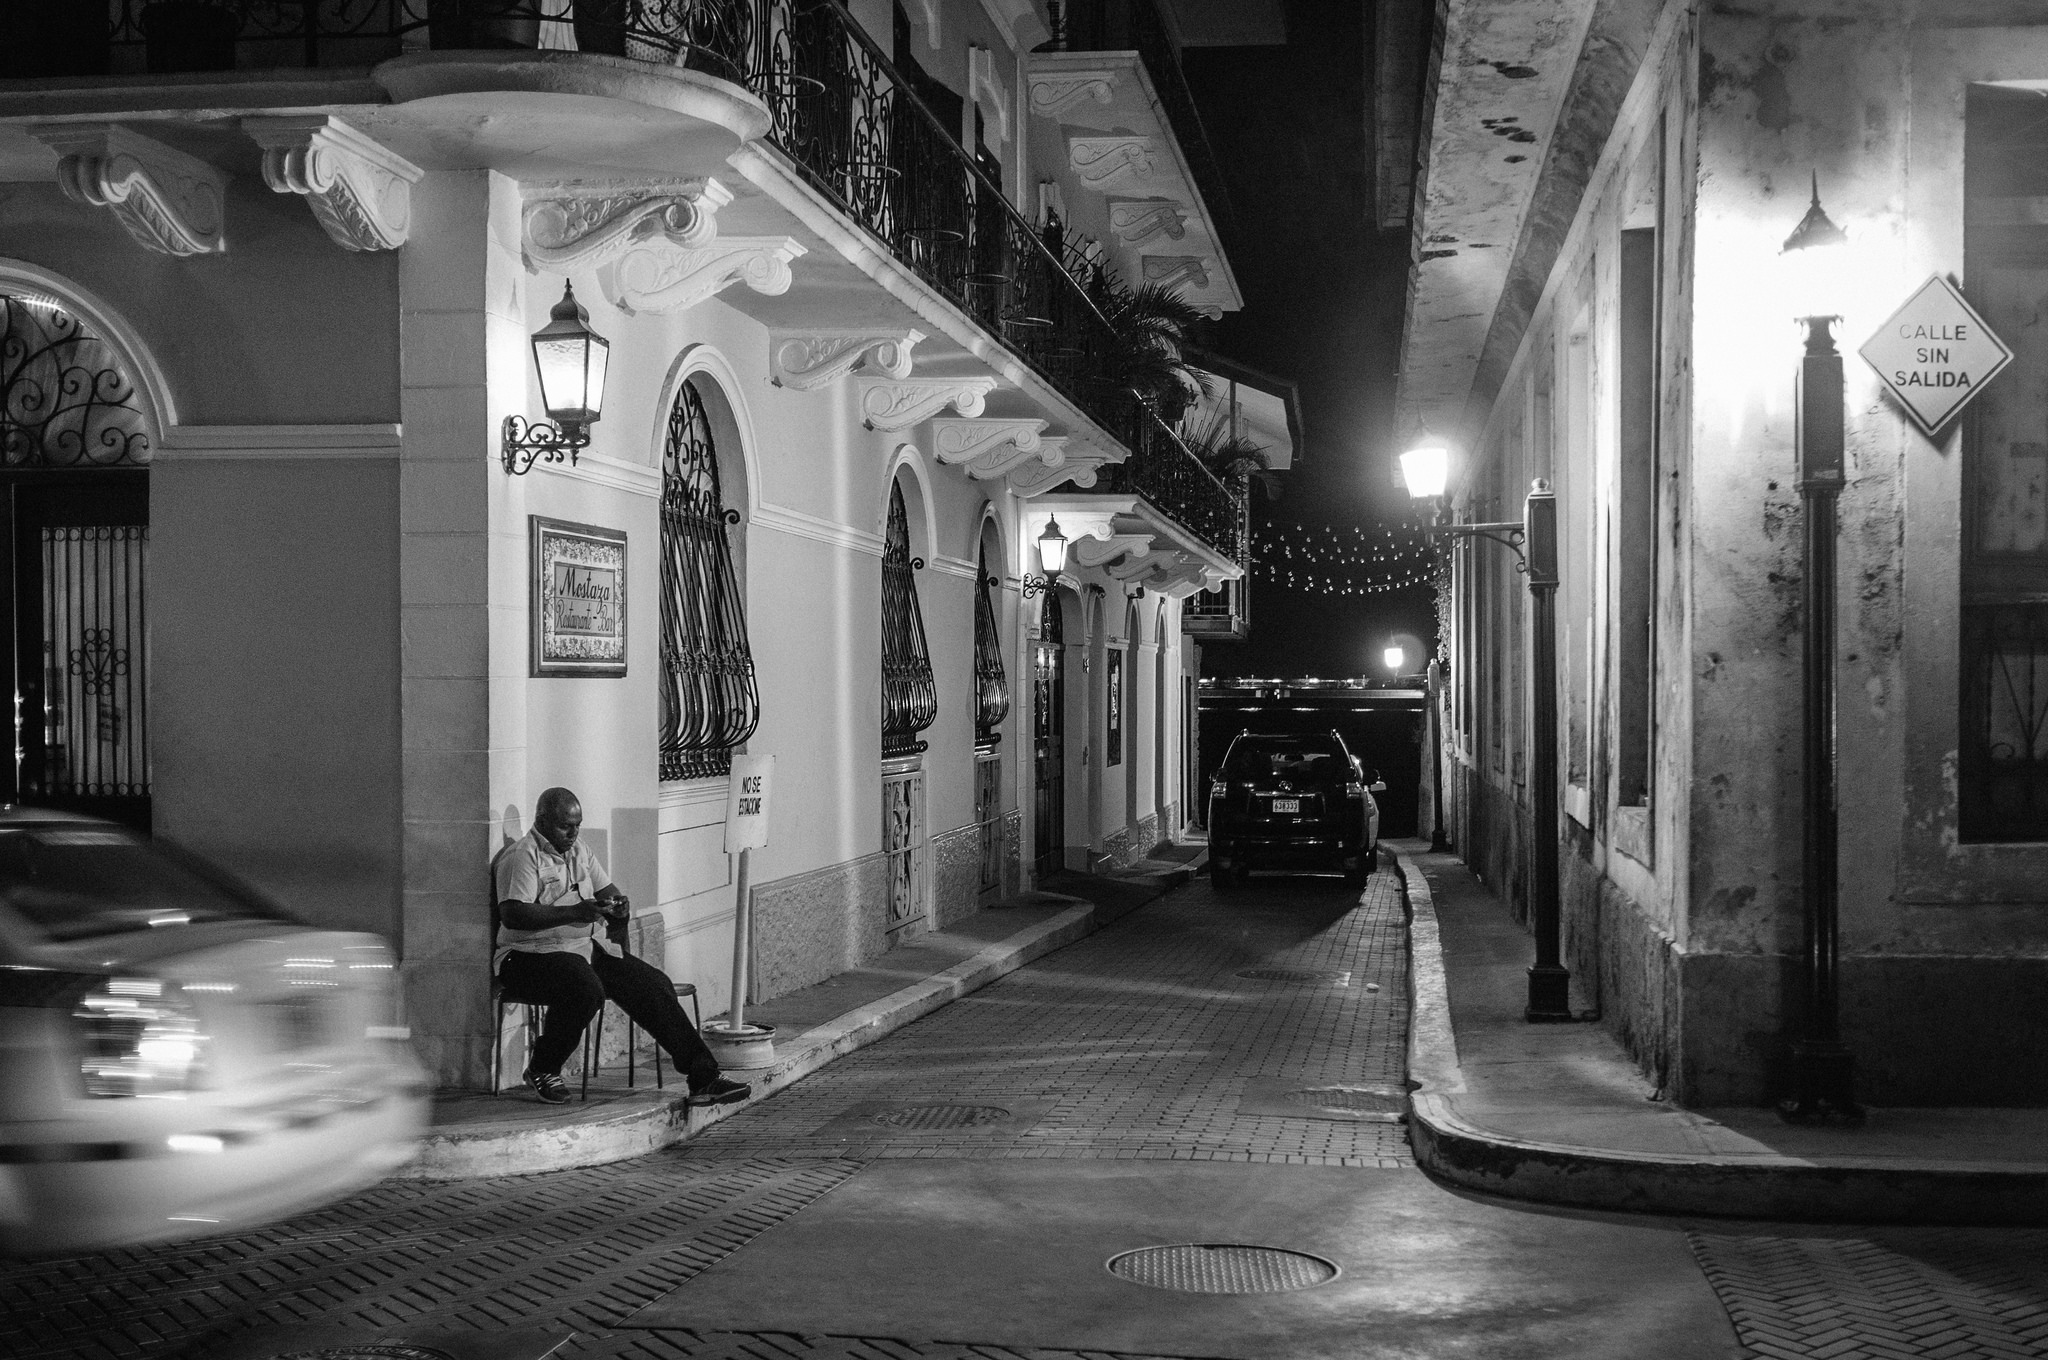 Flickr: Felipe Valduga